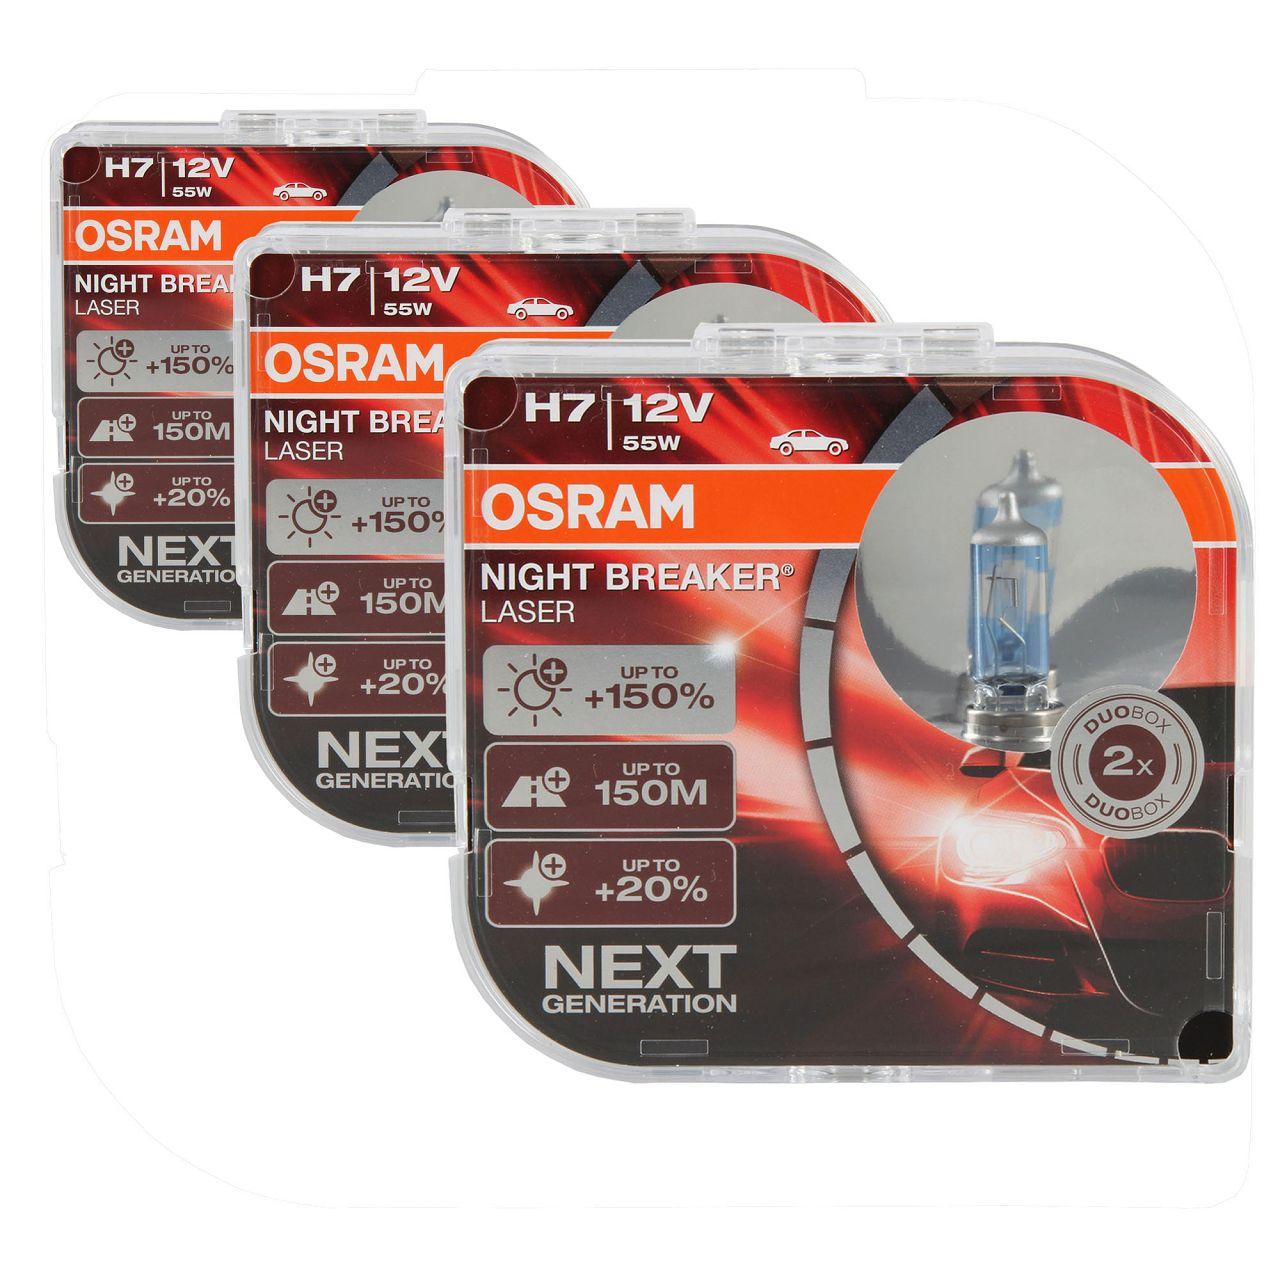 6x OSRAM Glühlampe H7 NIGHT BREAKER LASER 12V 55W PX26d next Generation +150%